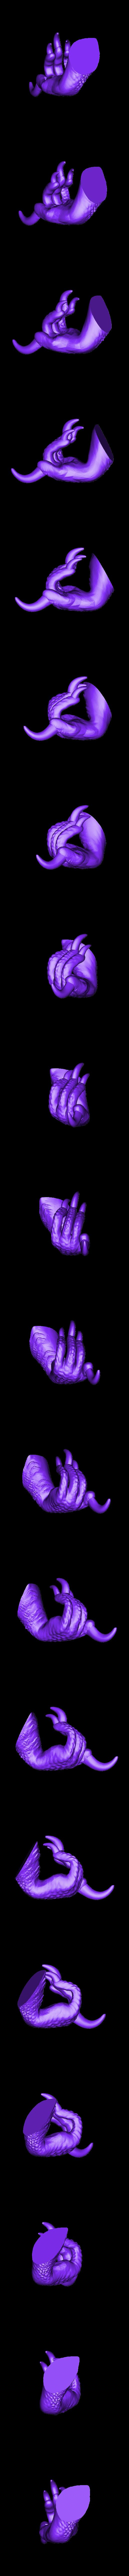 Grymloq_Left_Hand.stl Download free 3MF file One-Armed Dino-Jesus & His Pet Tyrannosaur • 3D printing model, EmanG